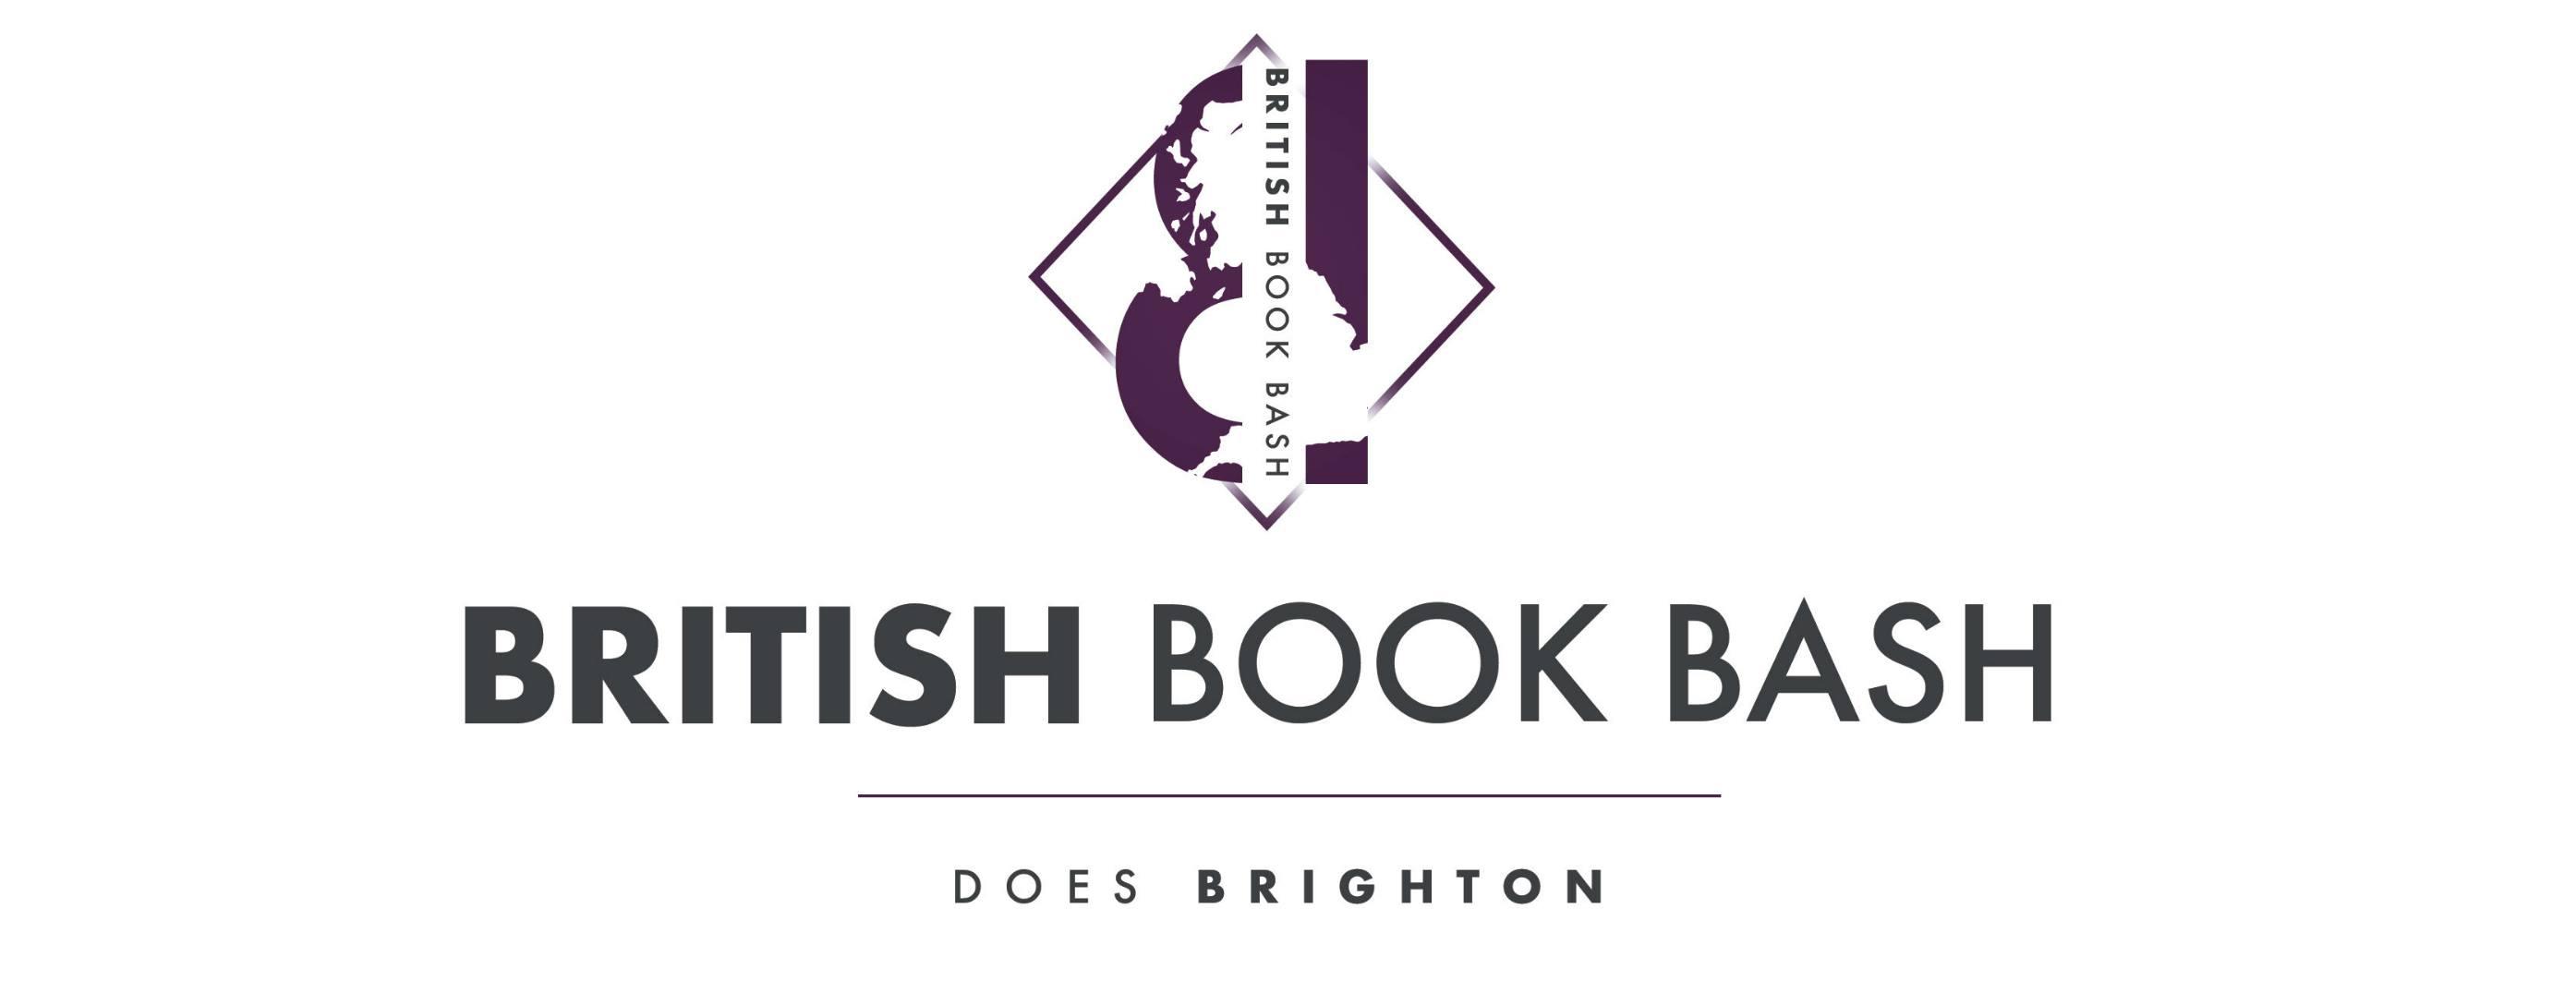 BritishBookBash does BRIGHTON 2018